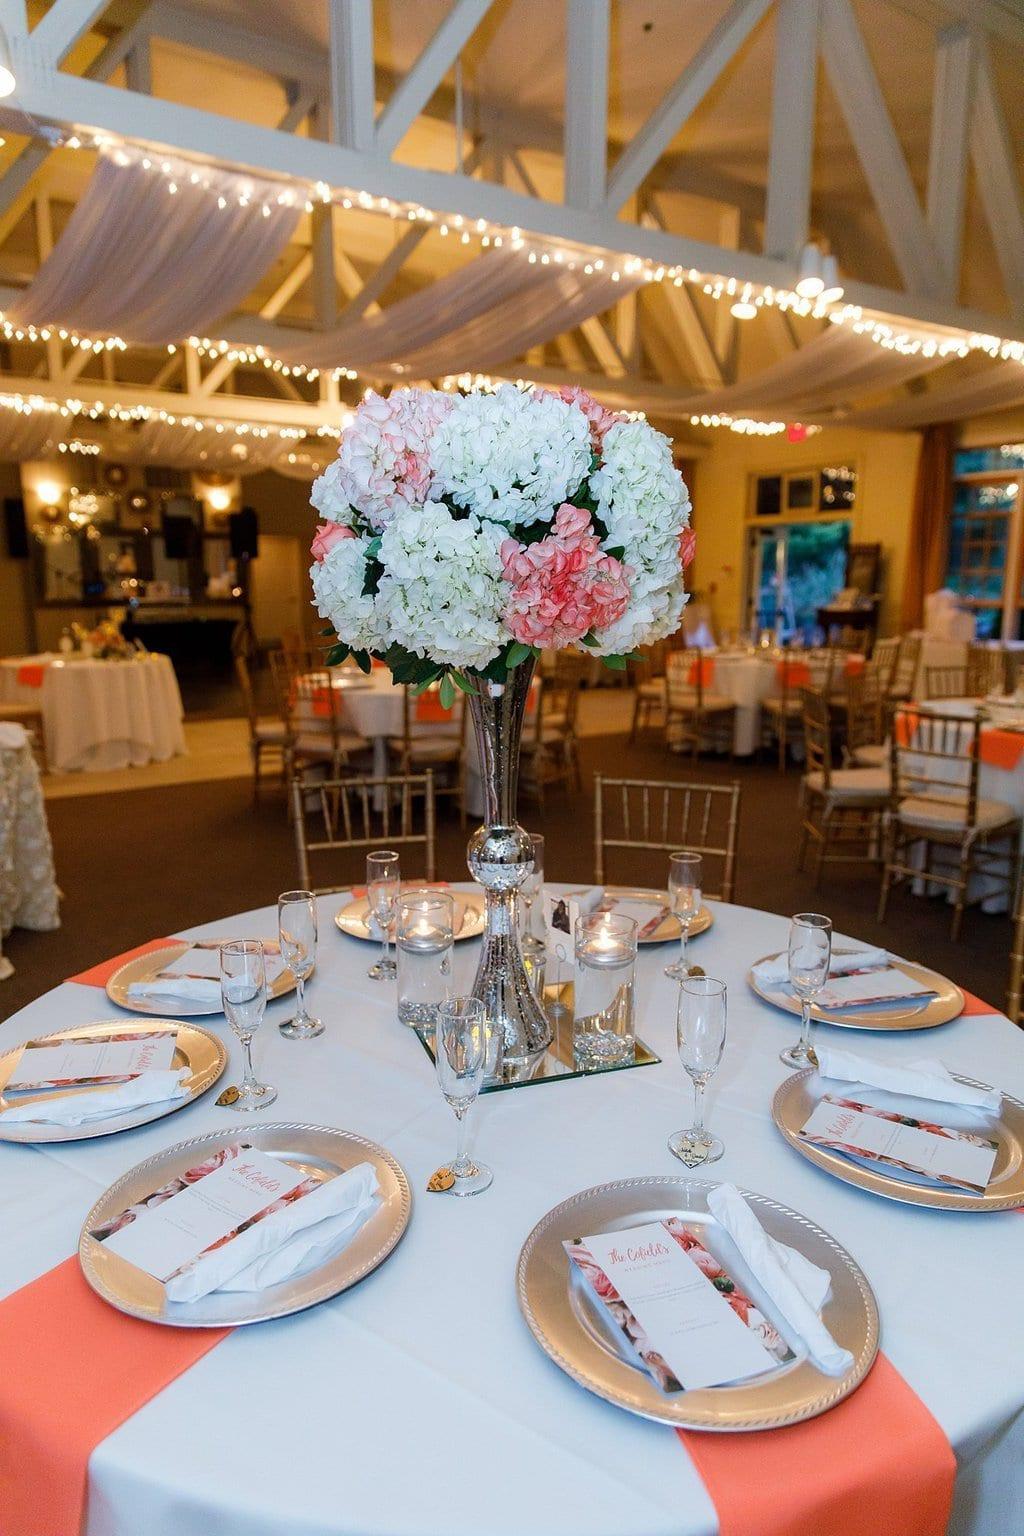 Gold wedding chargers, tall floral arrangement